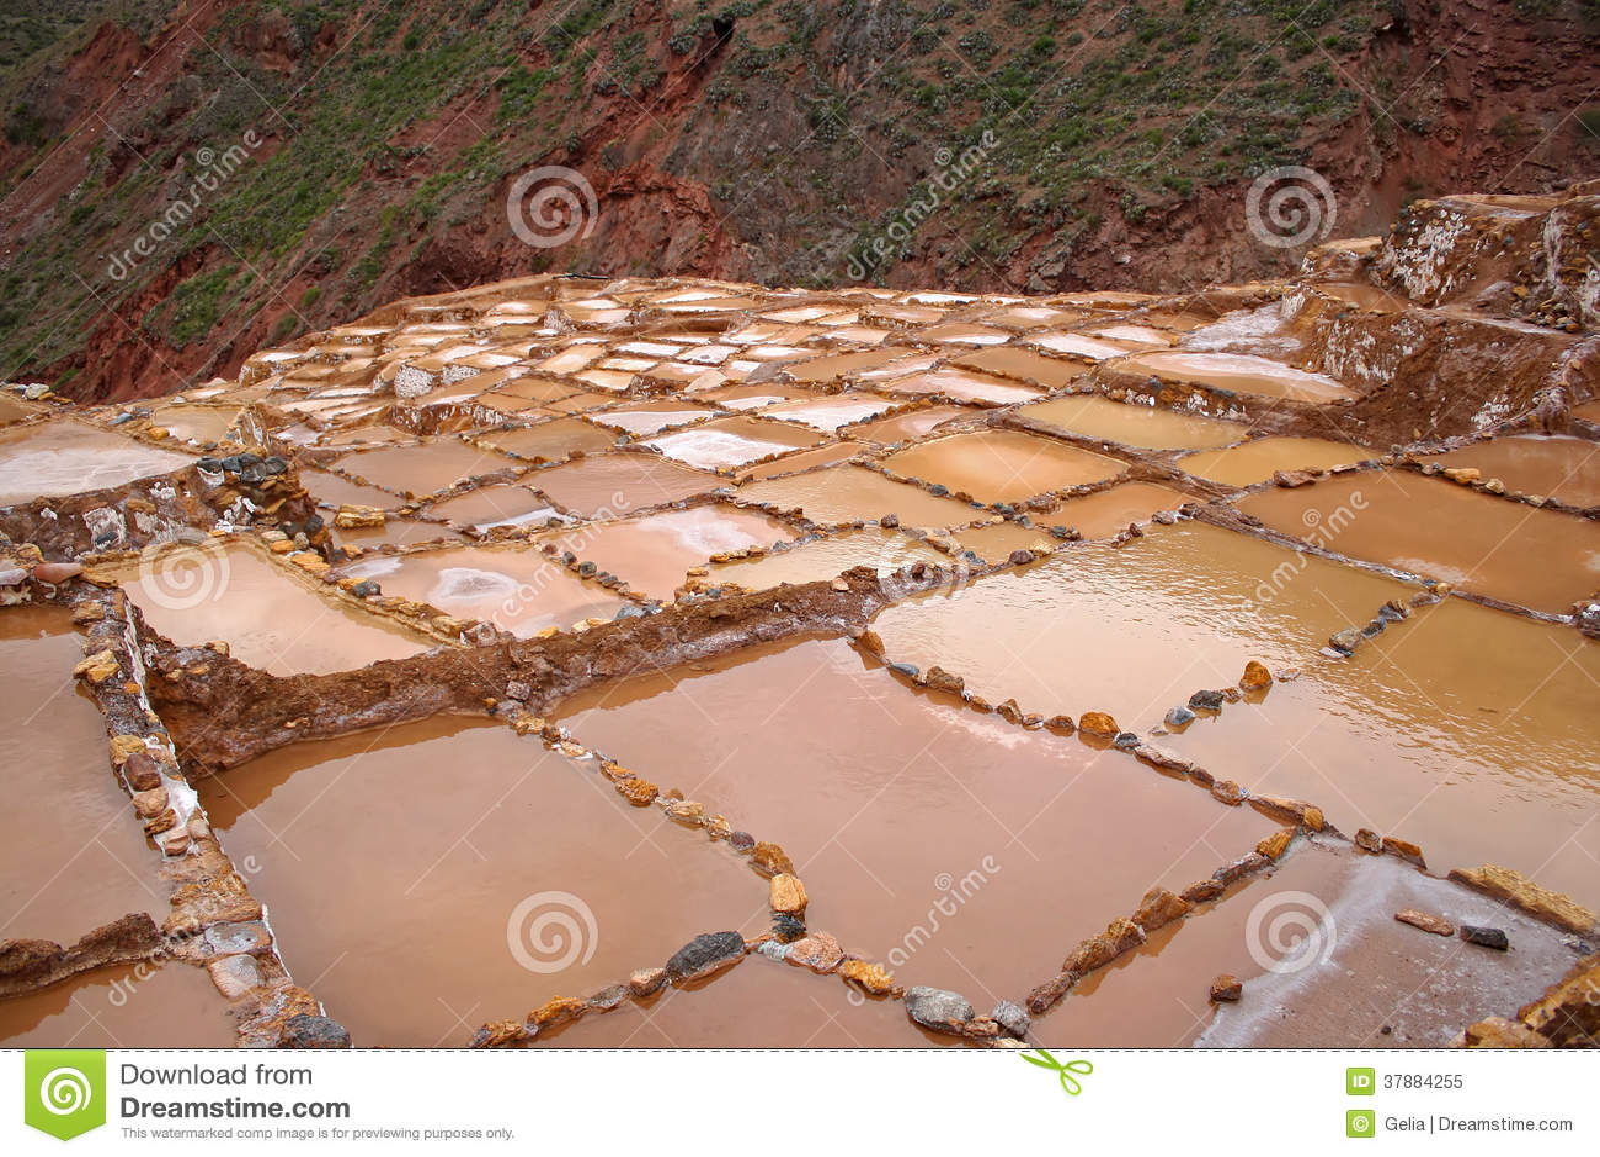 Saltworks in Maras, Peru